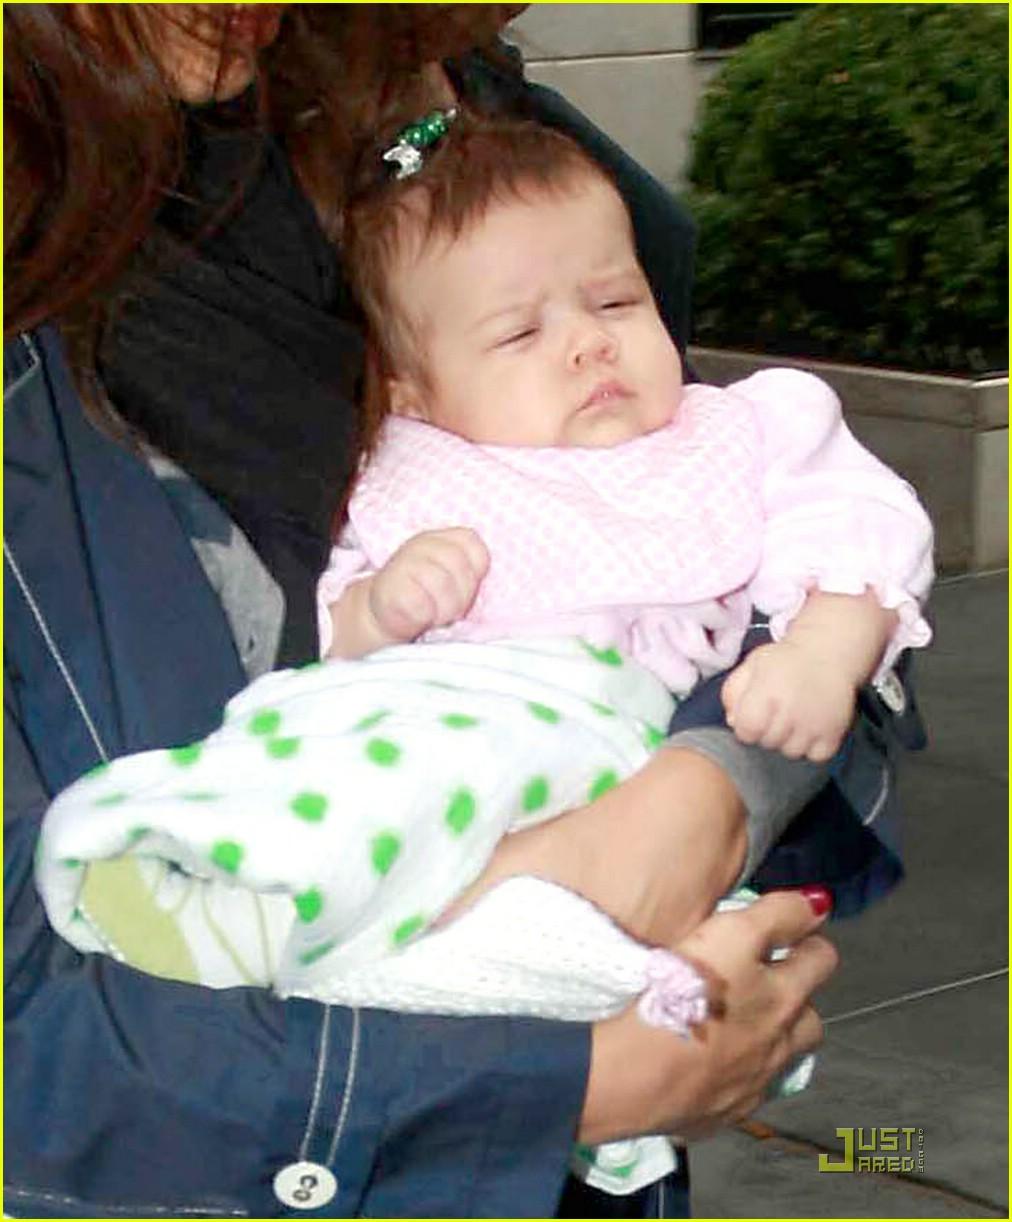 jessica alba shows off baby honor 021410111